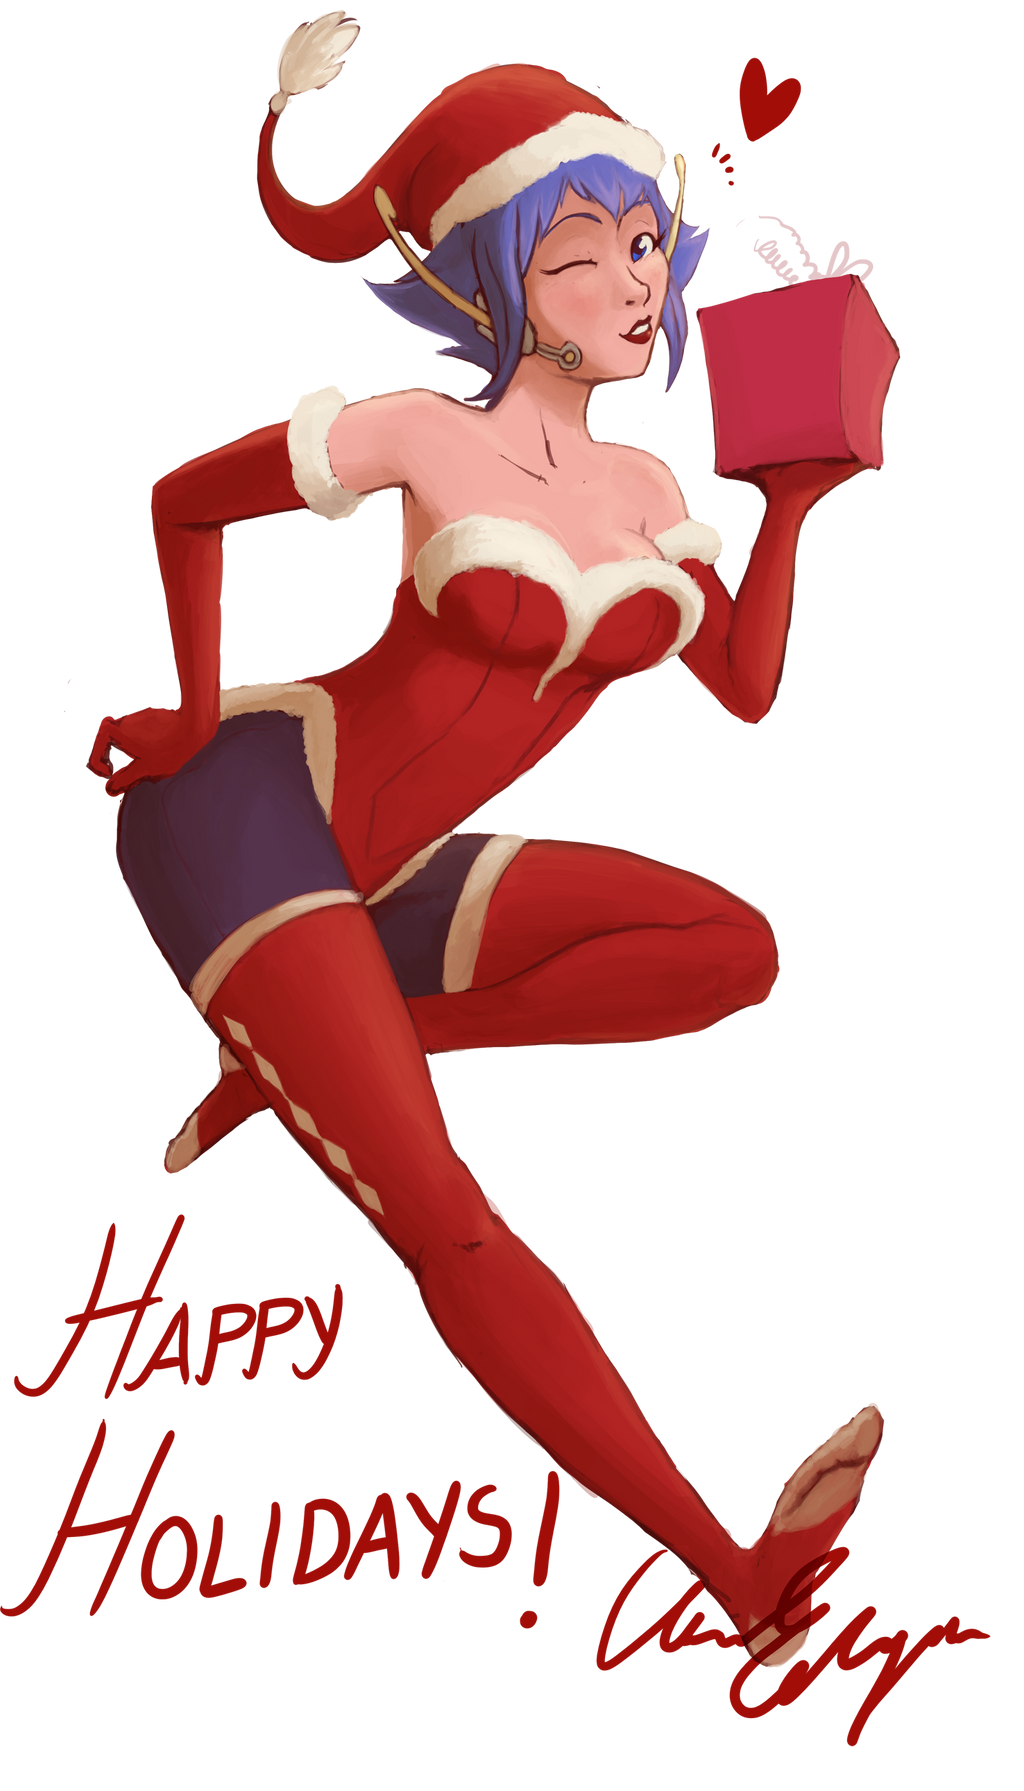 Holiday Xella by Viktormon